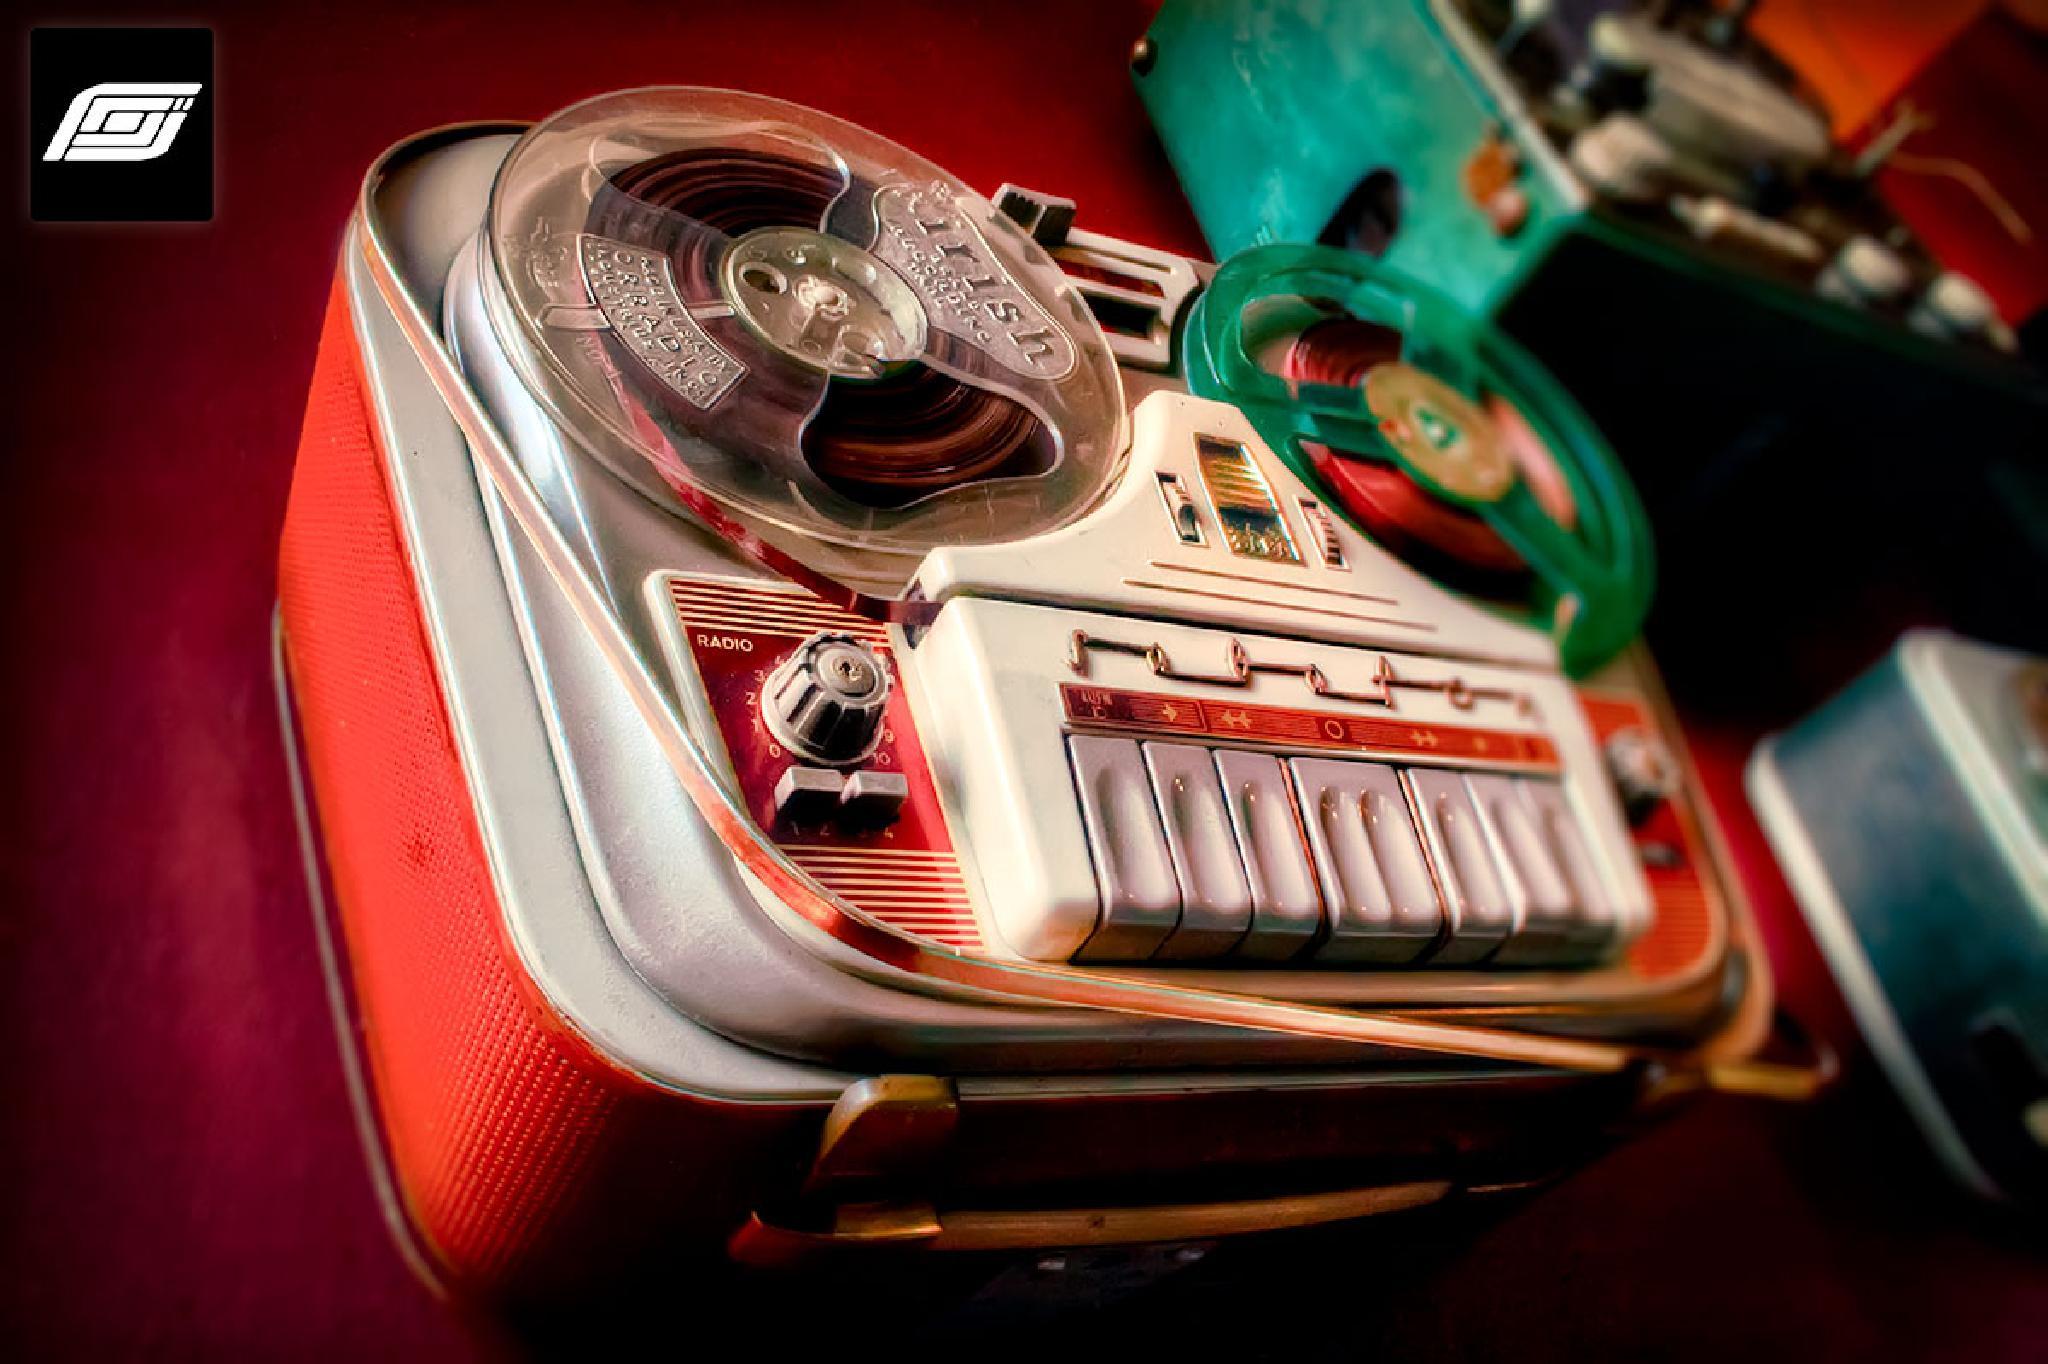 Cool Radio by grahamcummings